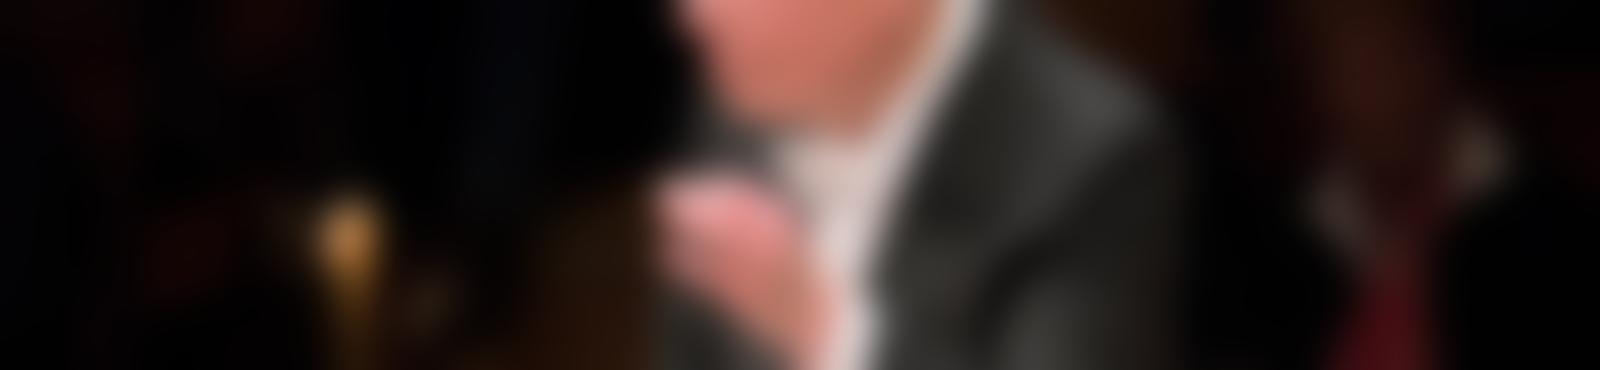 Blurred 6c6a0ba2 8db3 40bd 9fbd 848a75b5d9bc